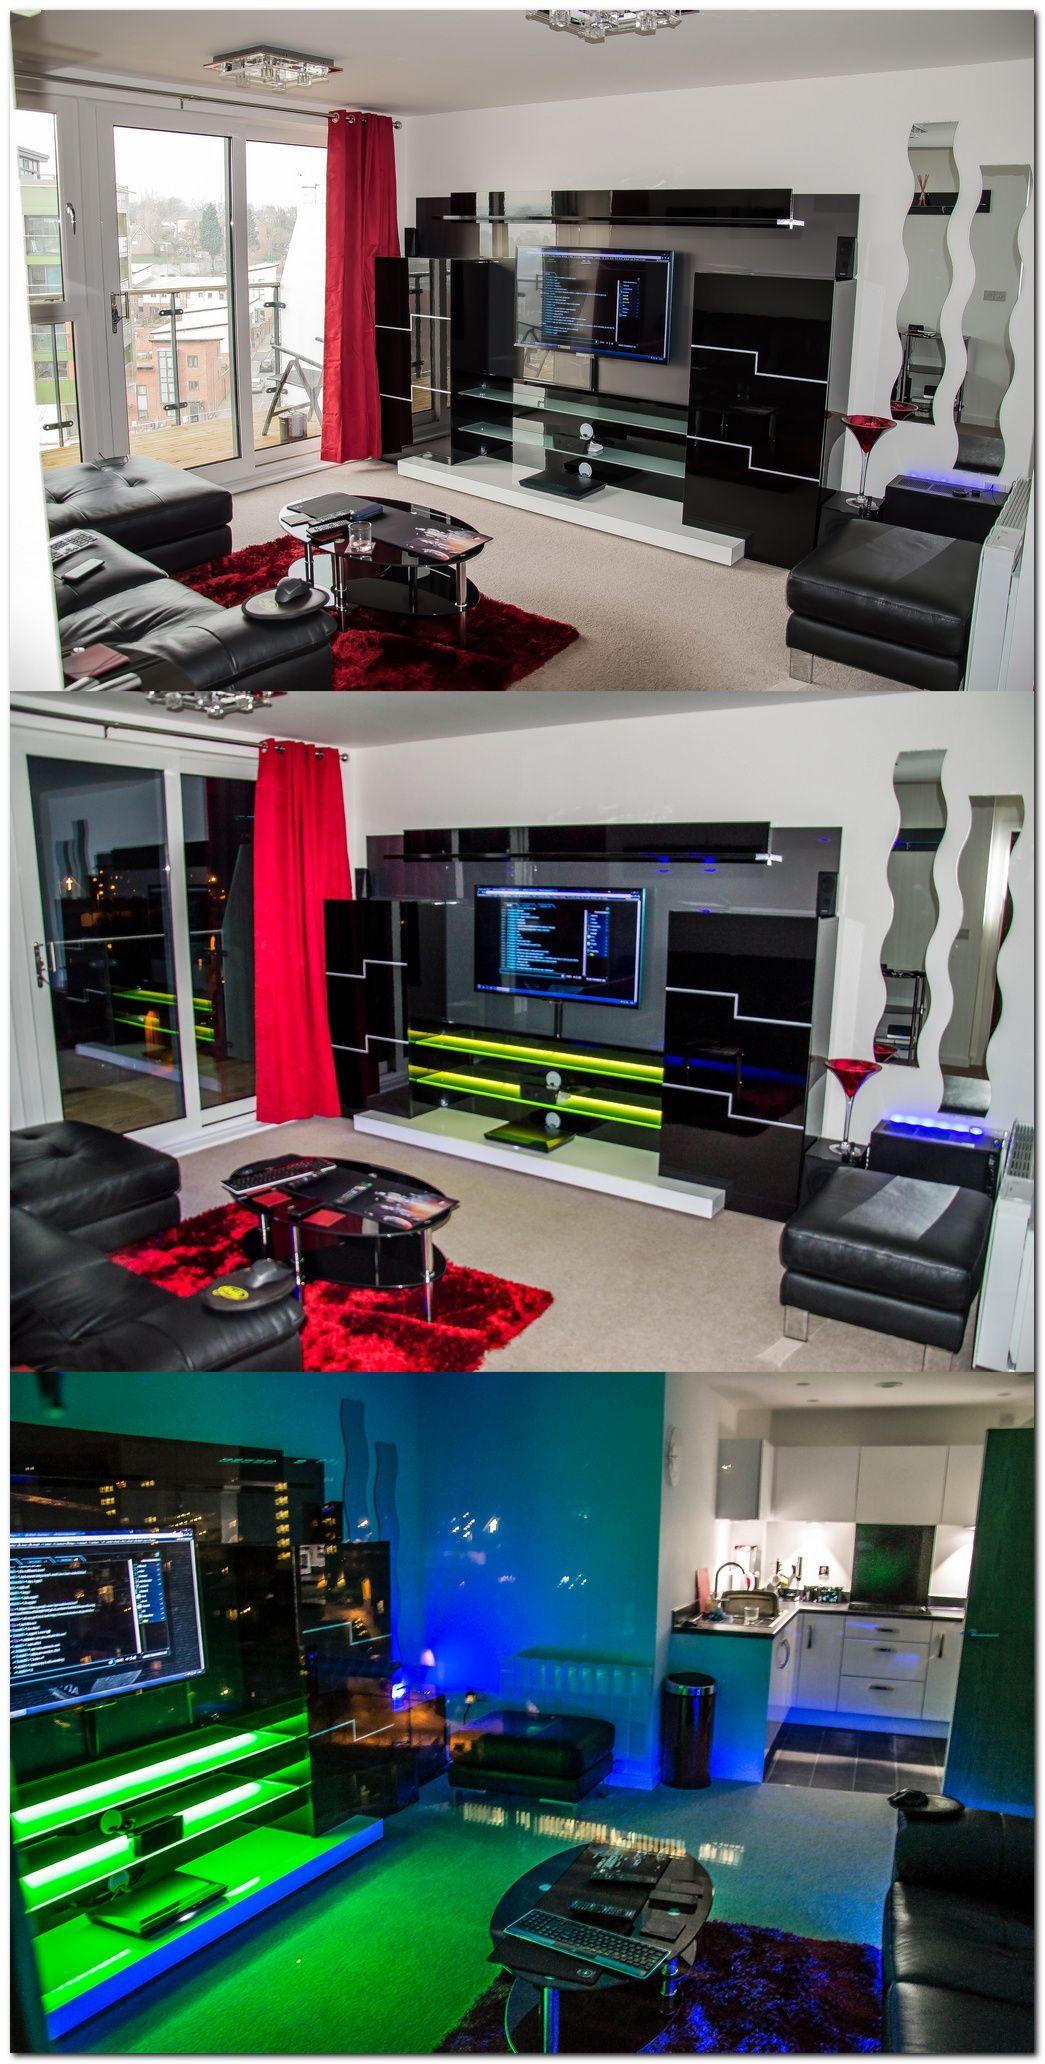 100+ Cool Interior Design Ideas for Gamers | Pinterest